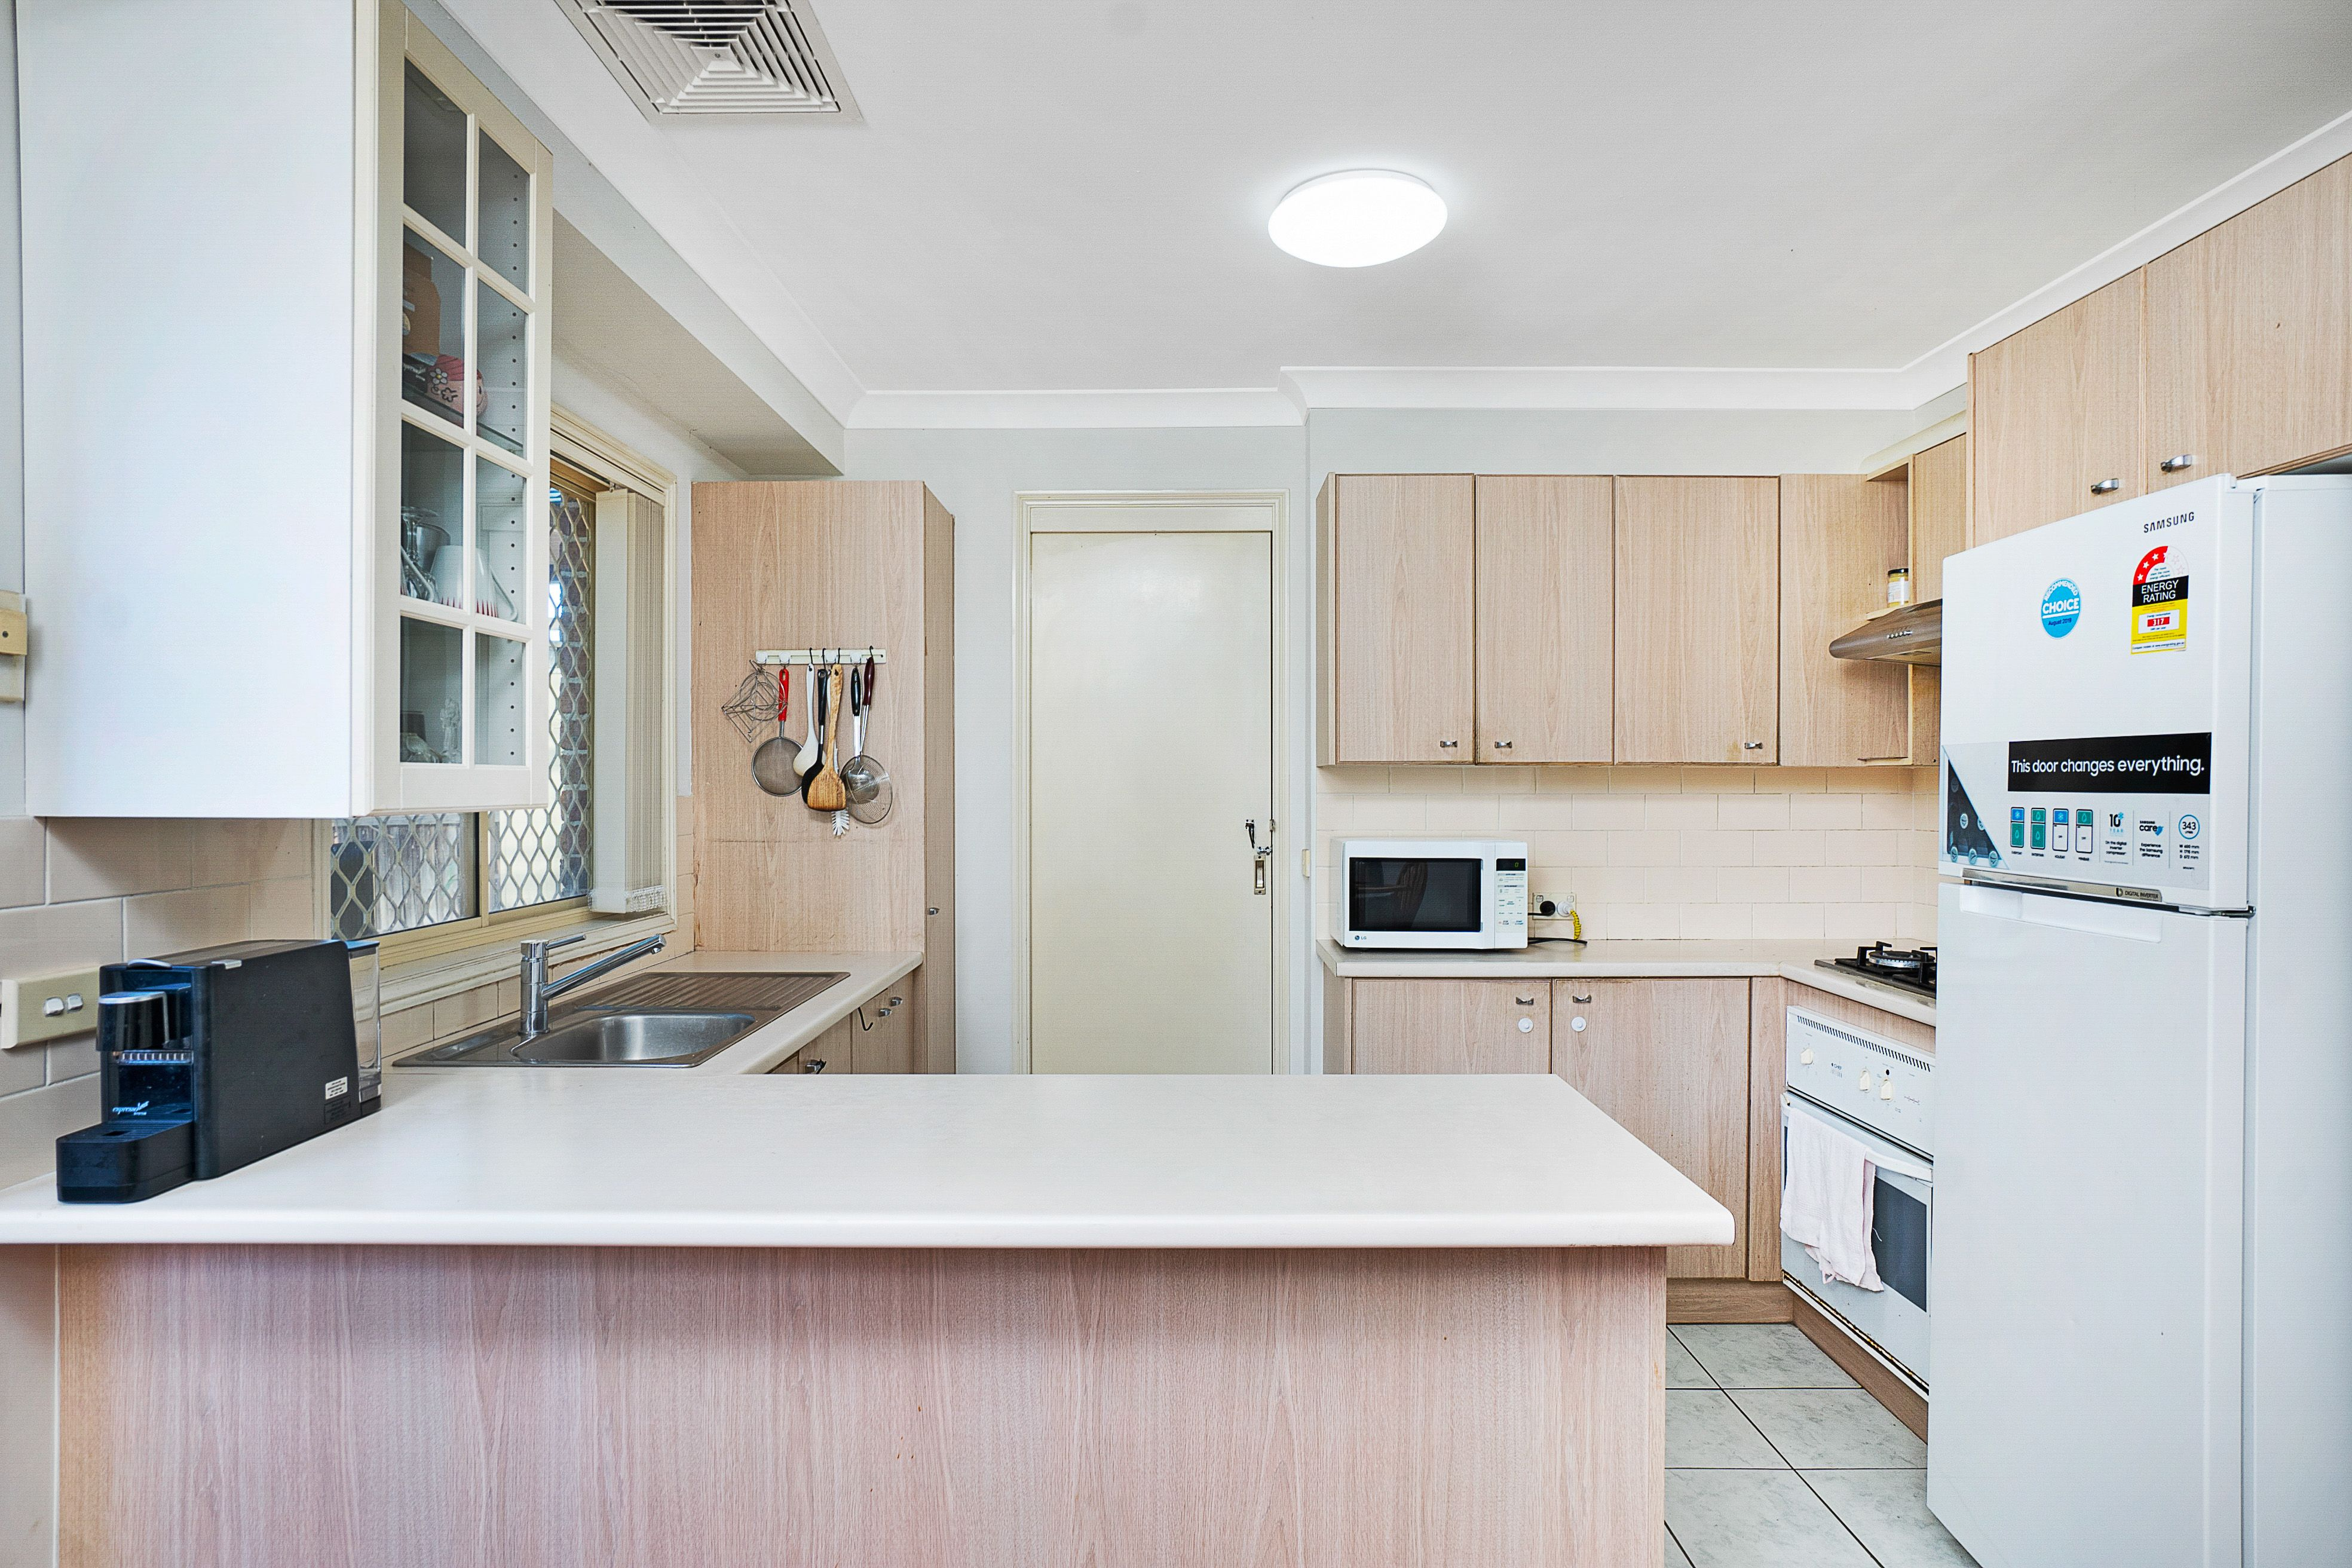 11/12 Bogan Place, Seven Hills NSW 2147